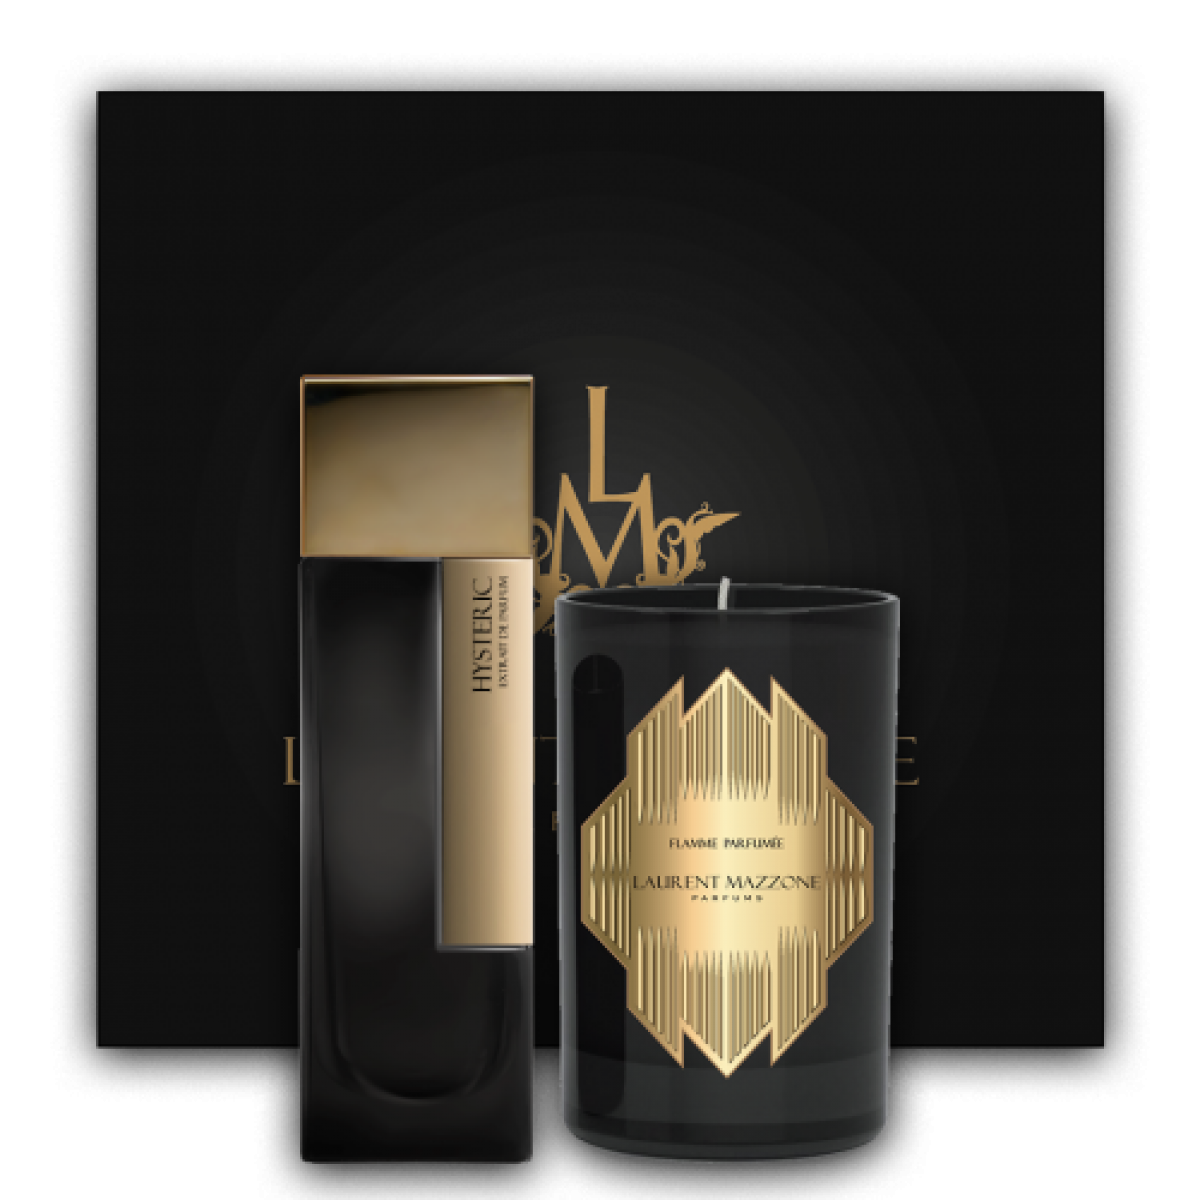 COFFRET HYSTERIC - LM Parfums